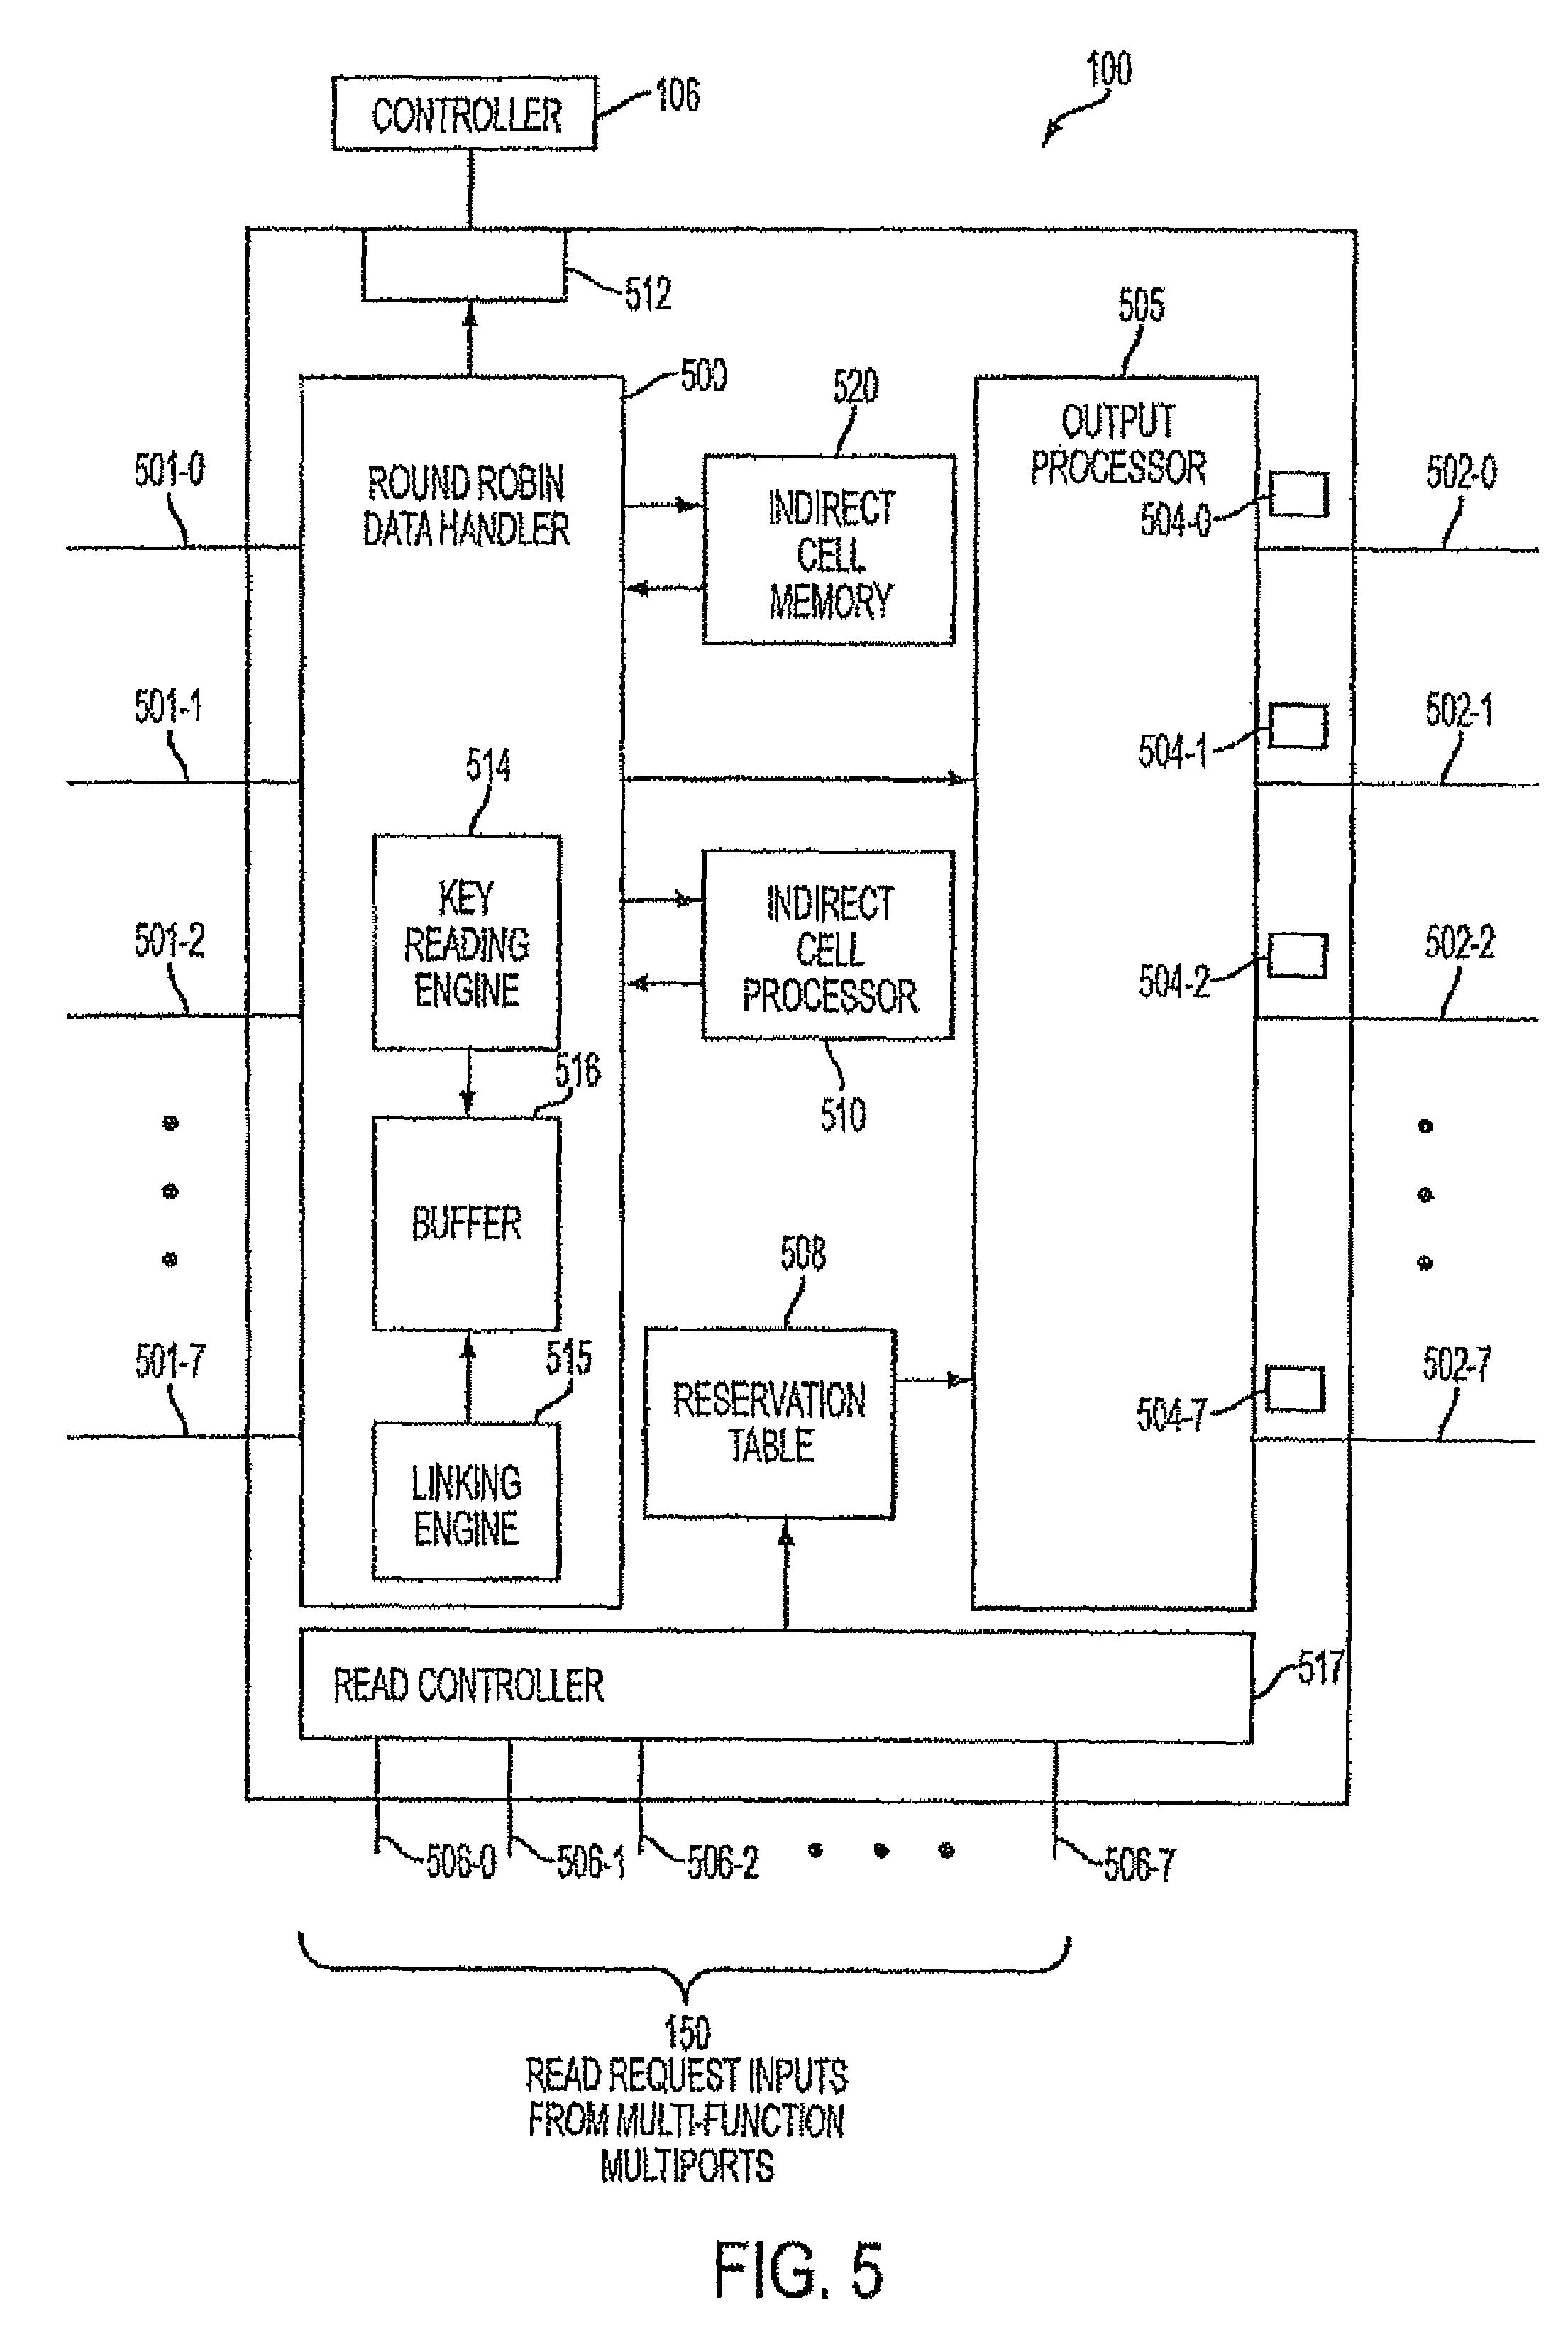 Patent US 7,986,629 B1